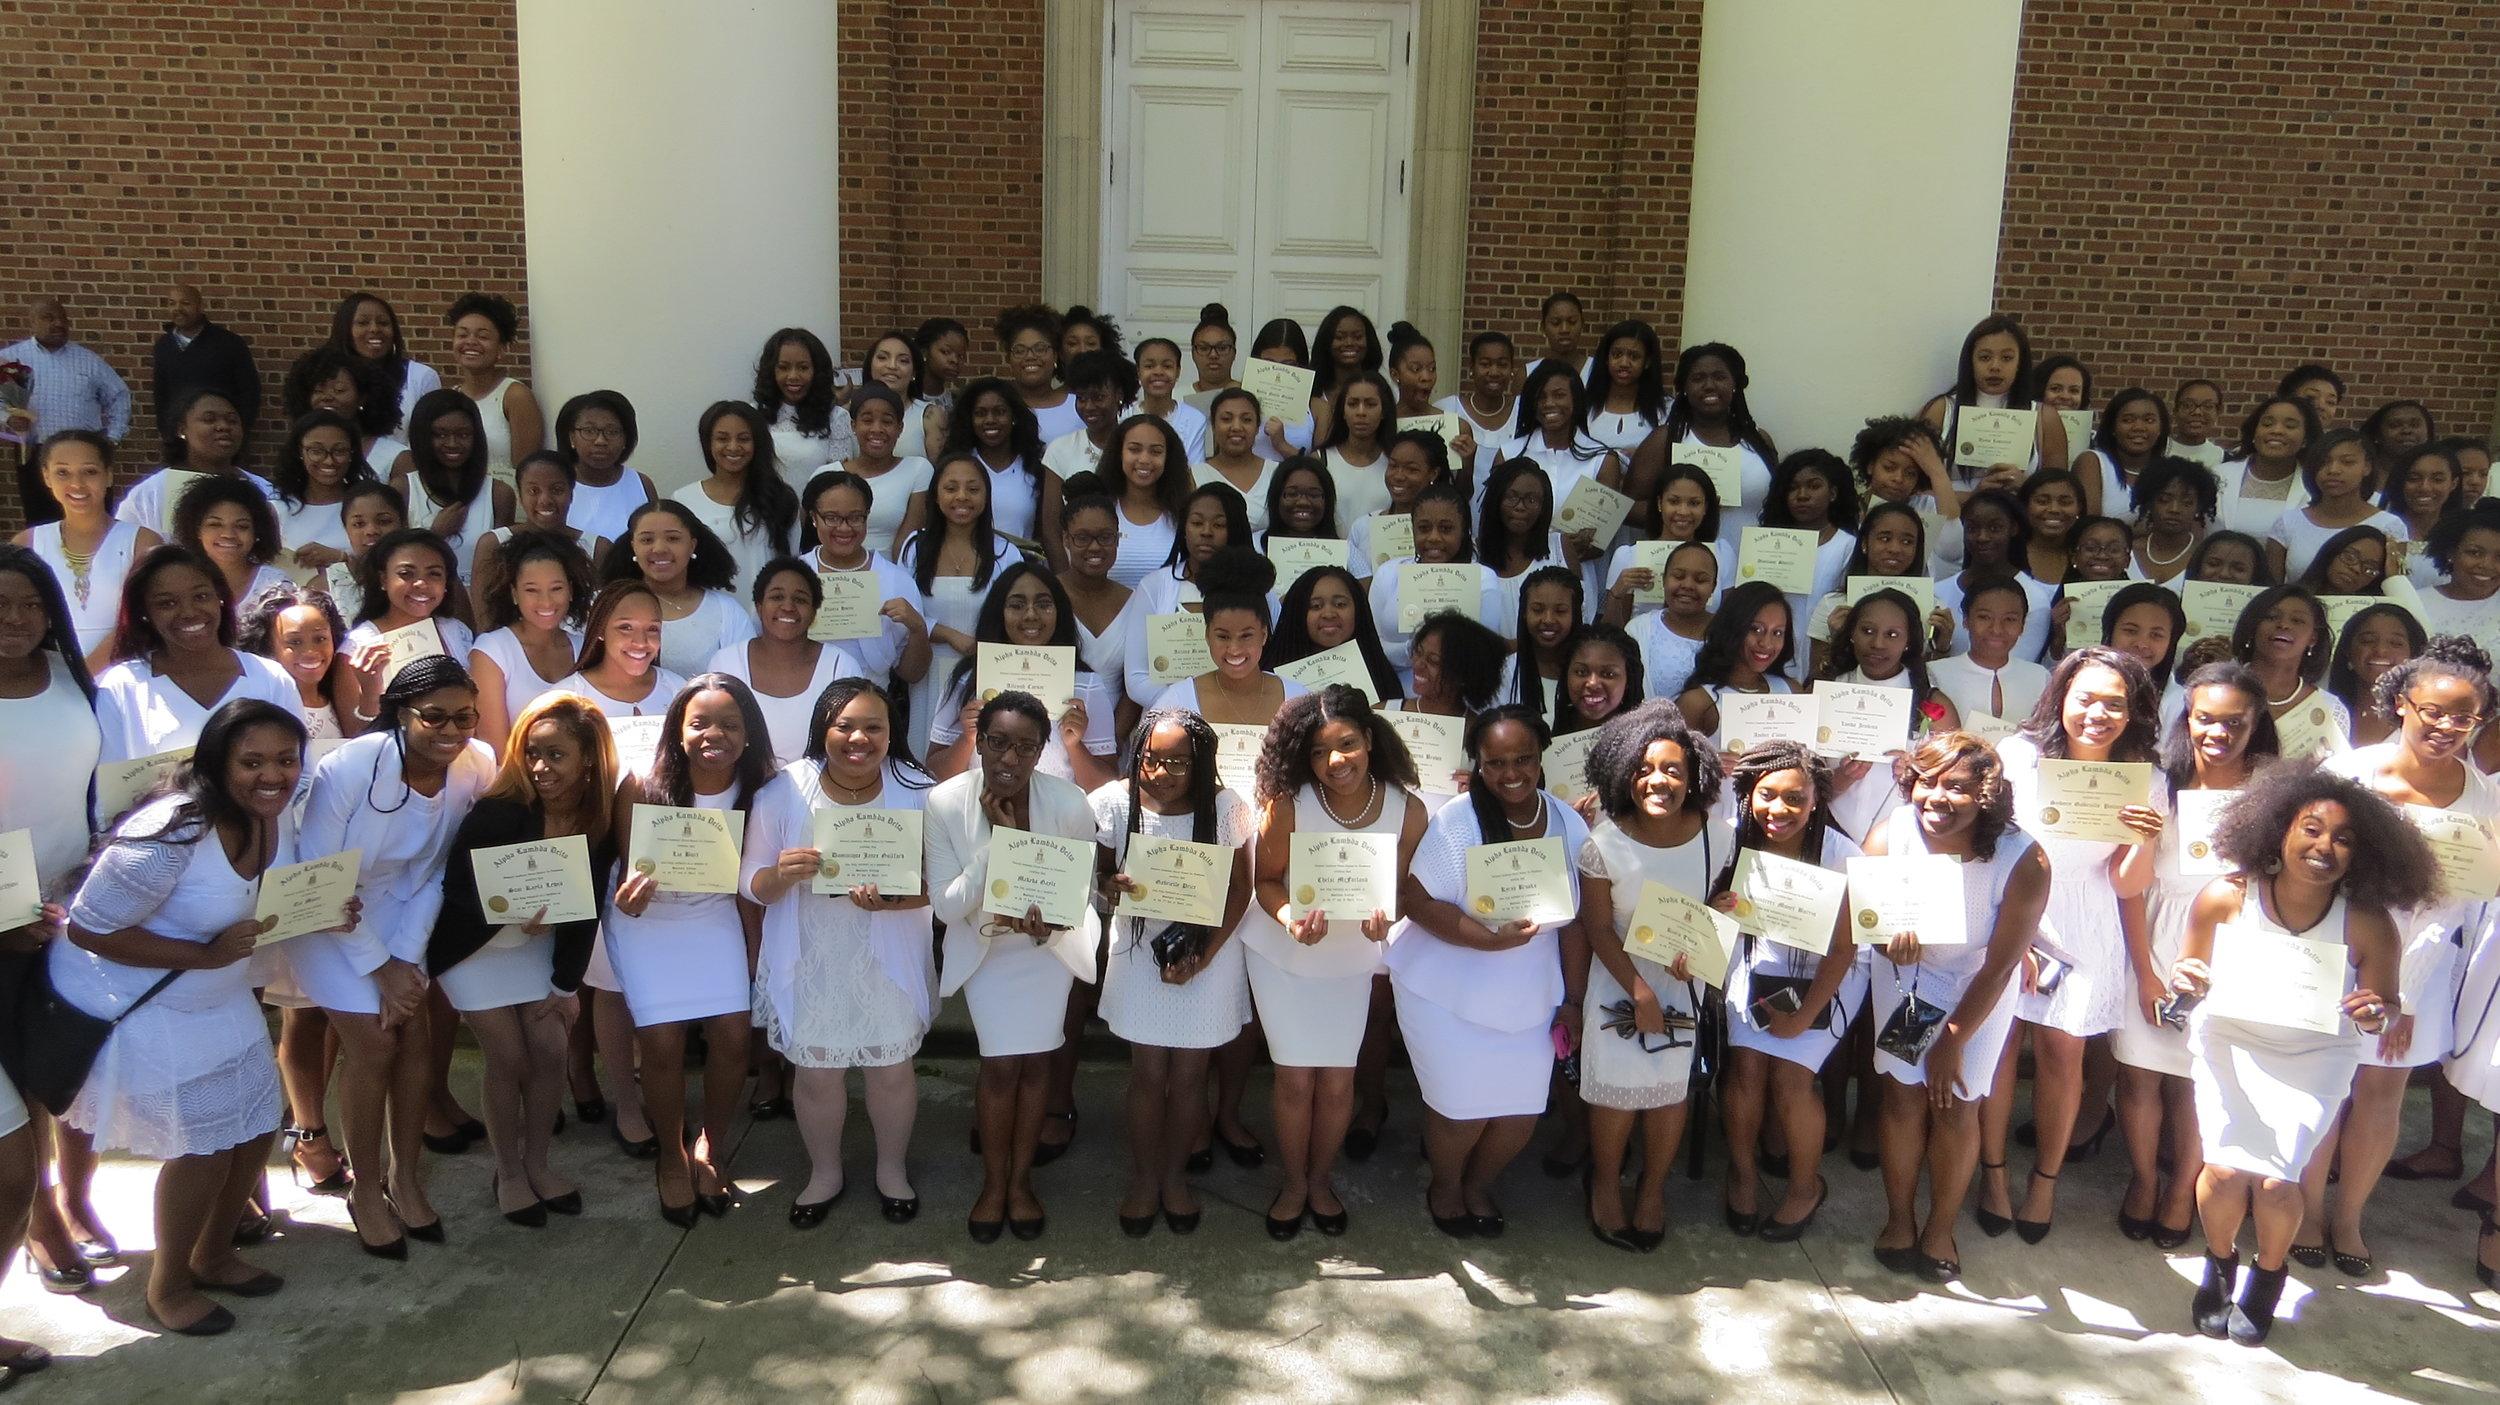 spelman college's 2016 induction ceremony